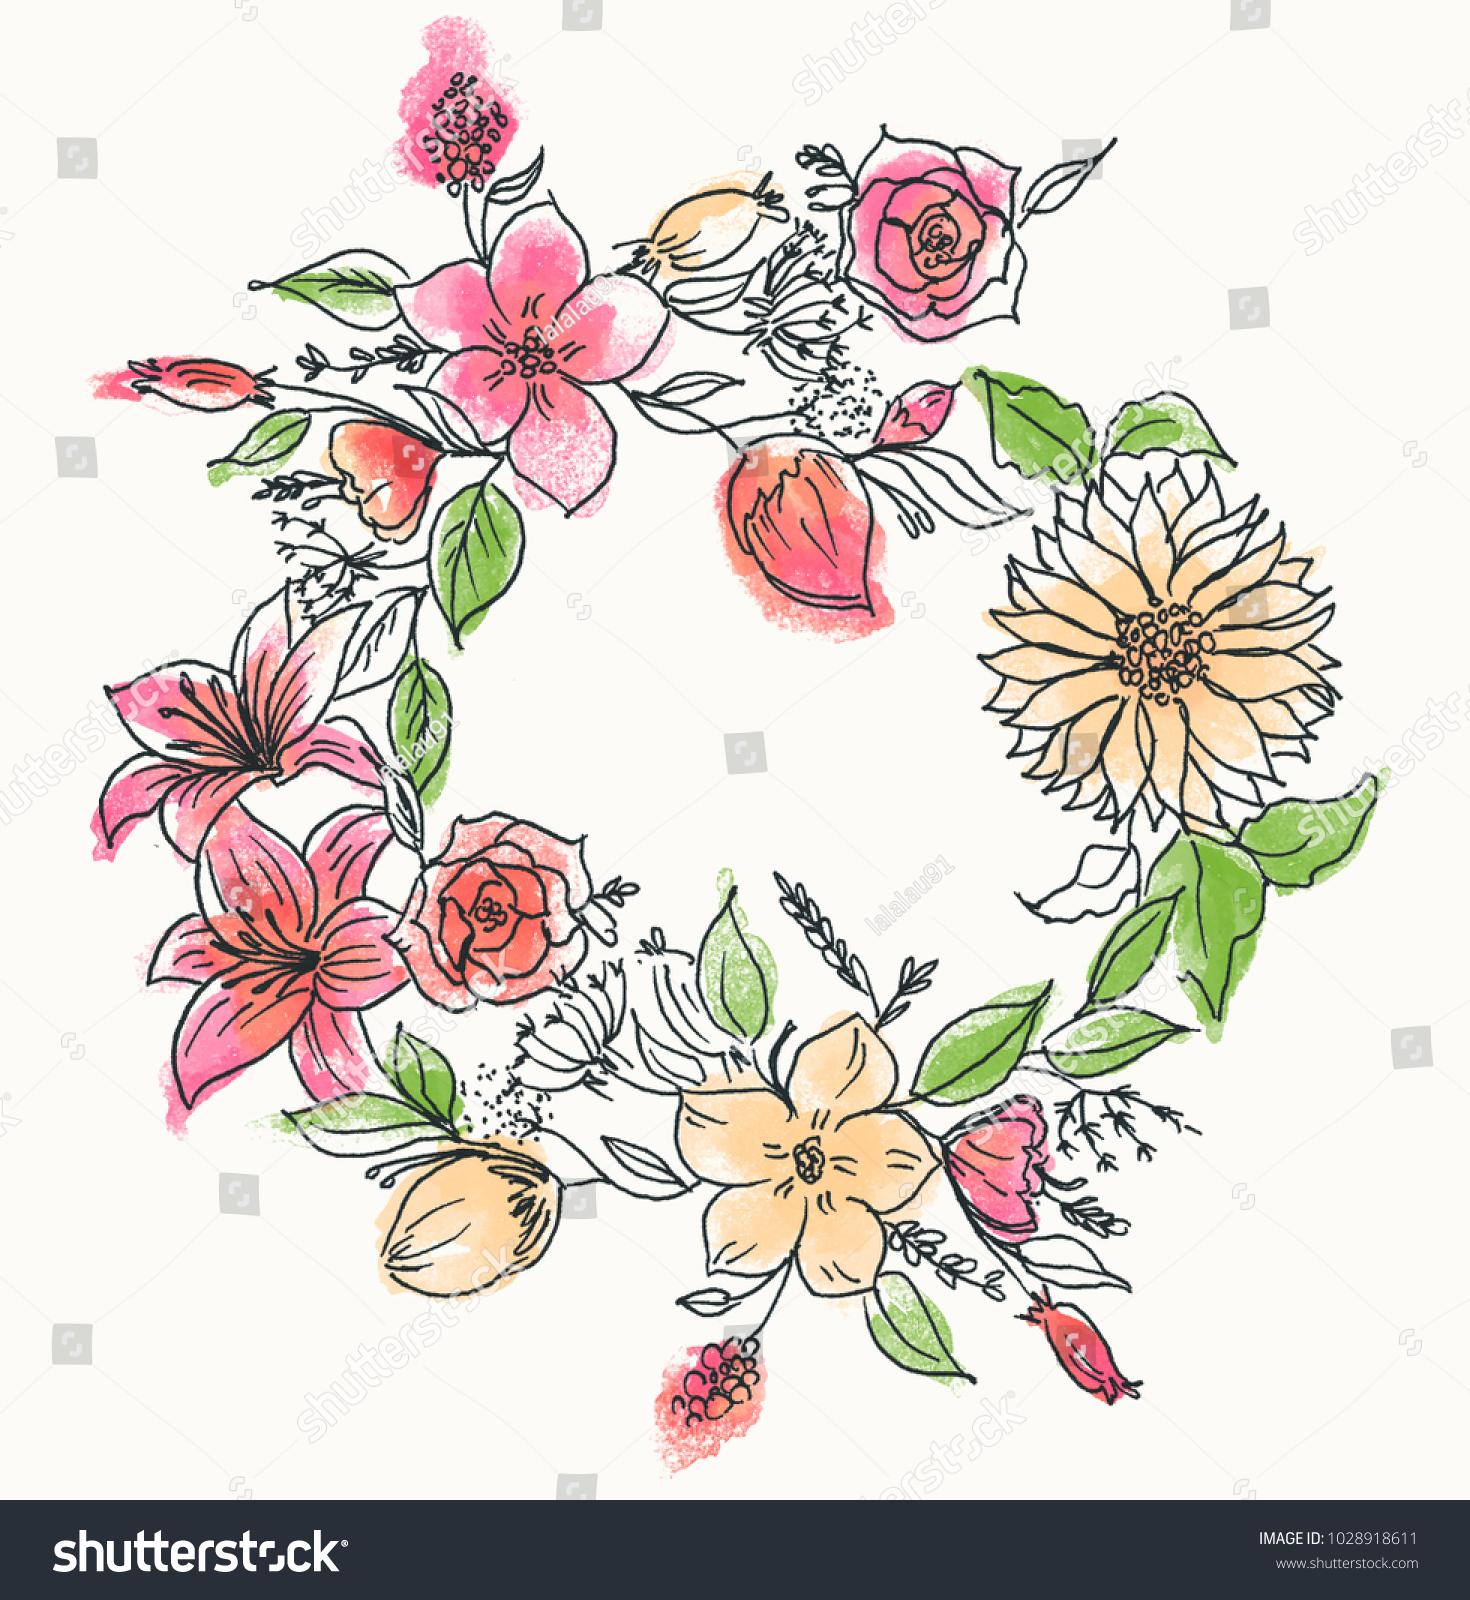 Flower Crown Watercolour Illustration Stock Illustration 1028918611